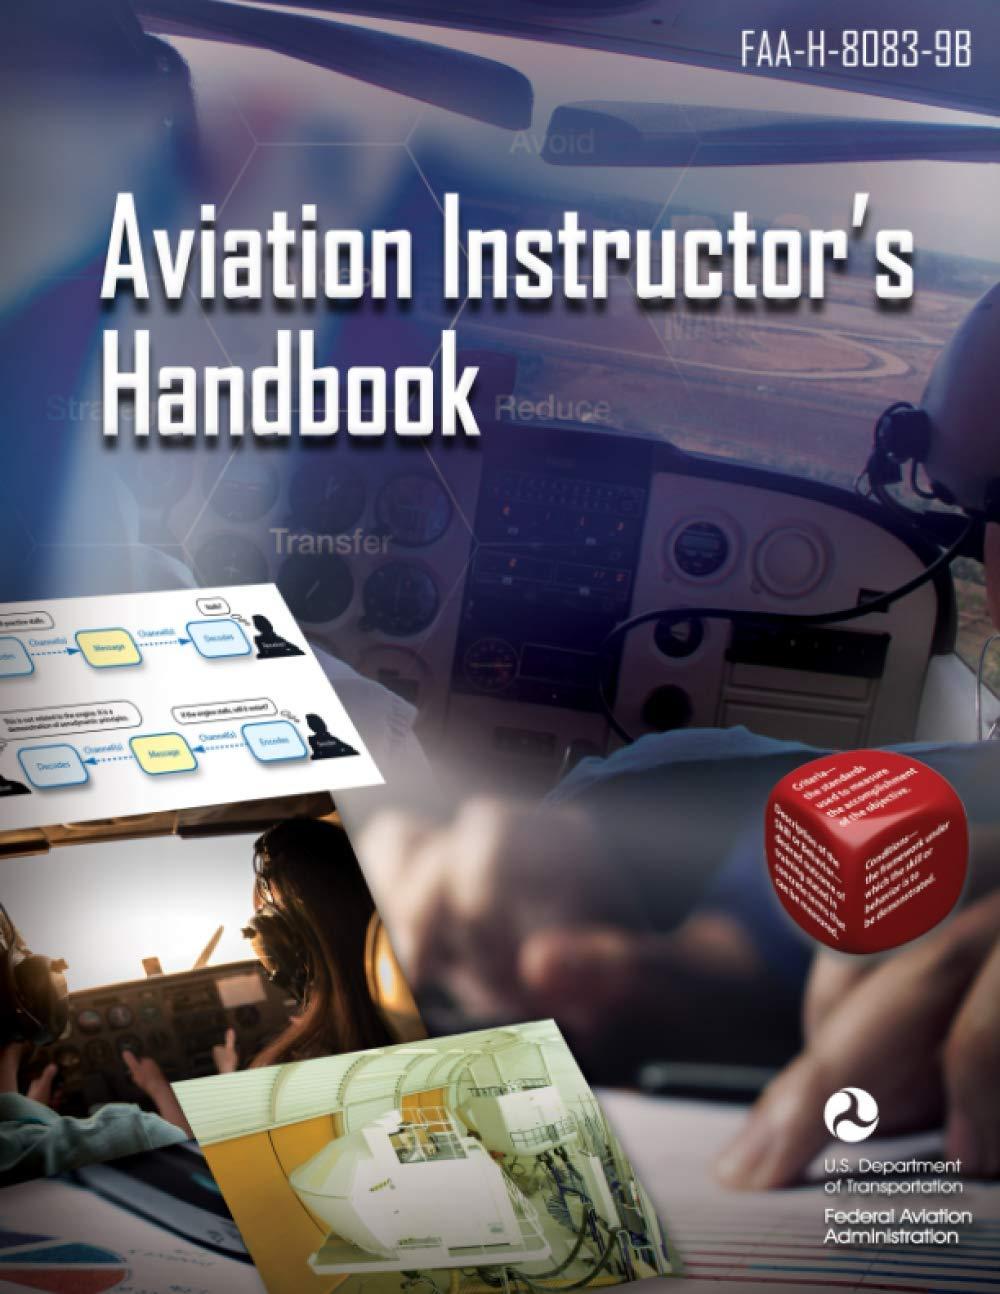 دانلود کتاب خلبانی Aviation Instructor's Handbook